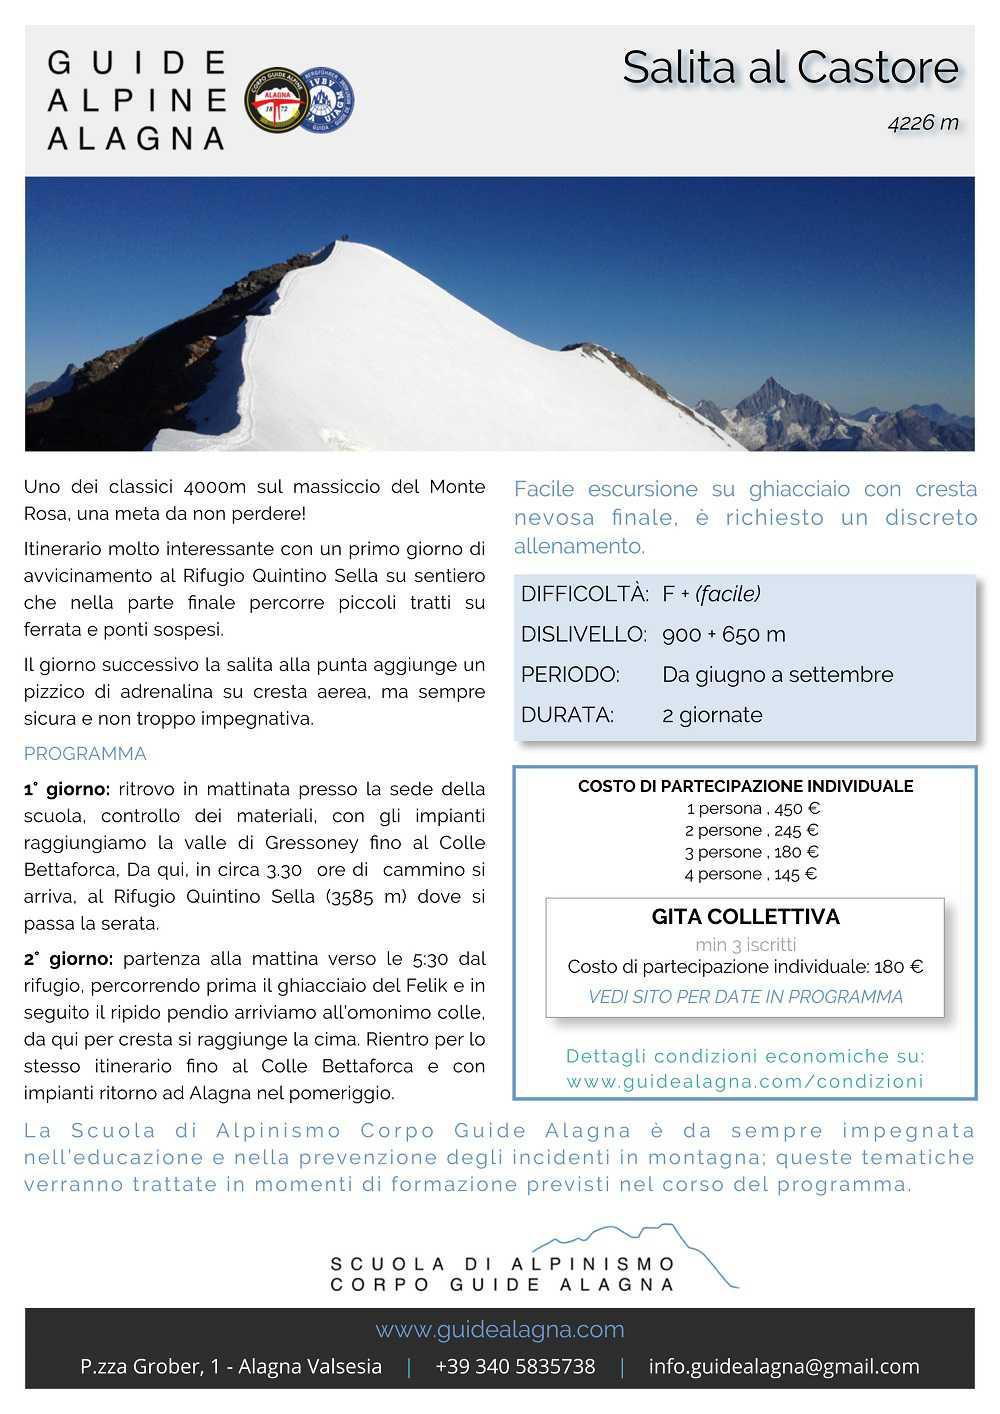 Salita al Castore - Guide Alpine Alagna